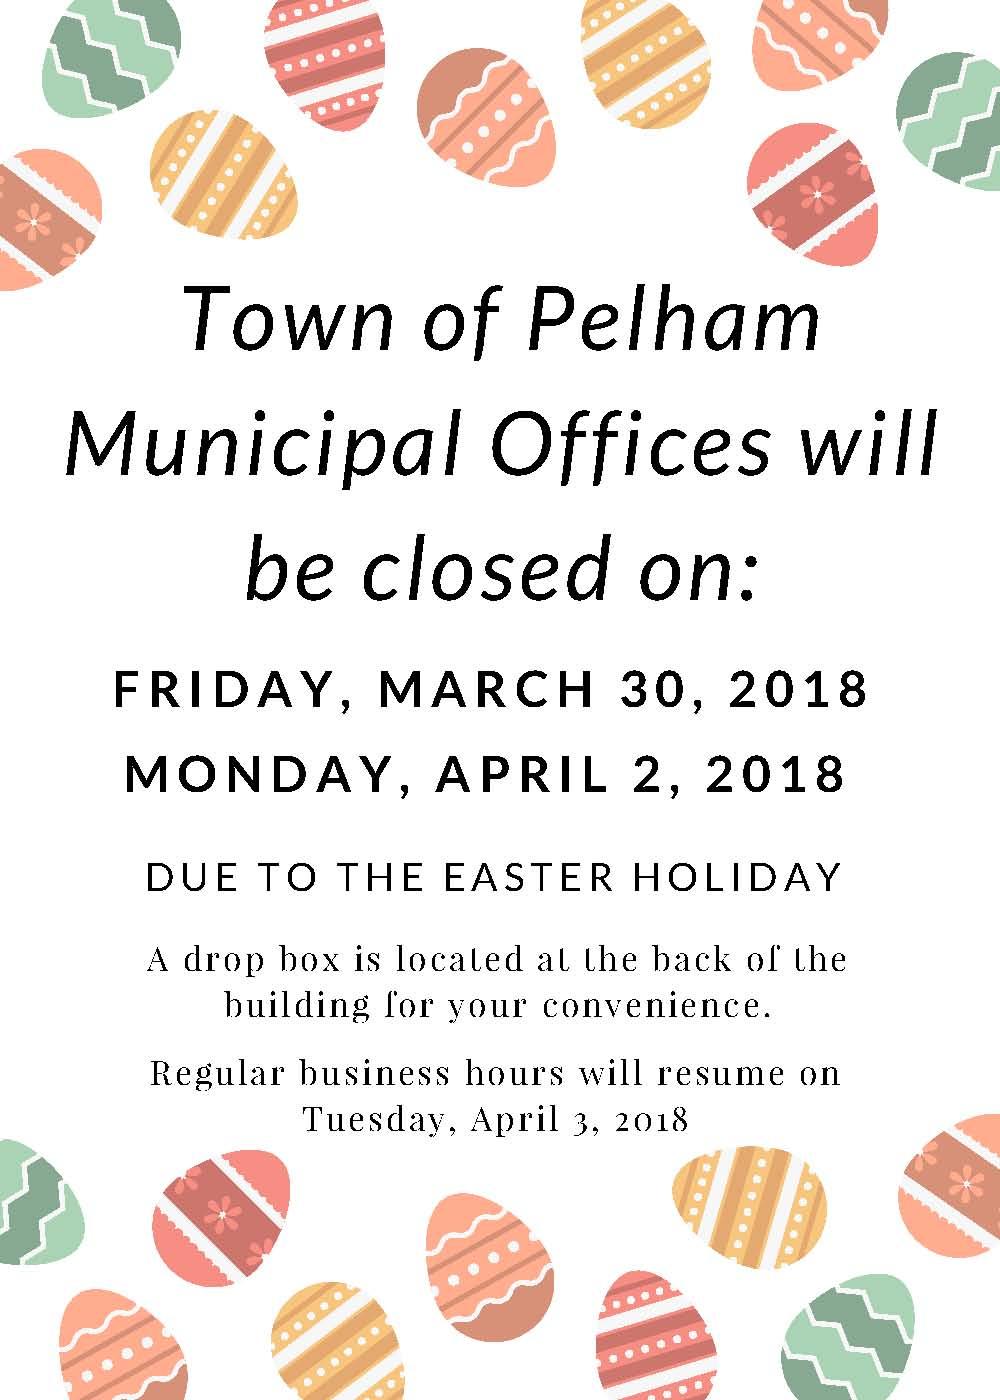 Easter Closure 2018